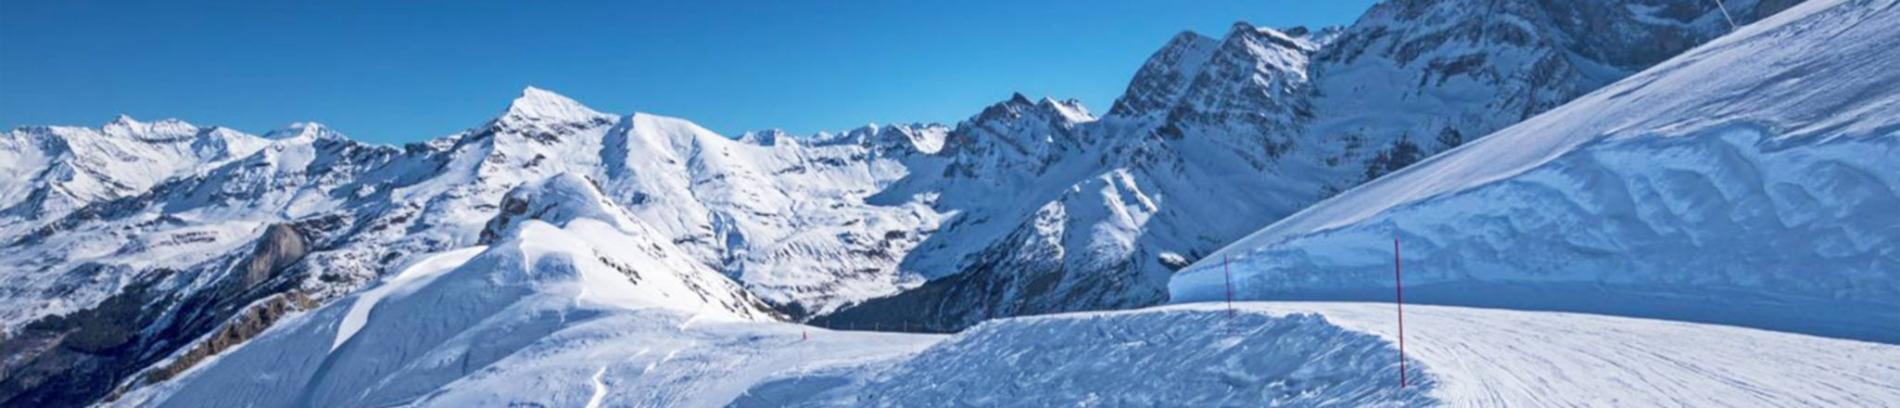 Slide domaine skiable